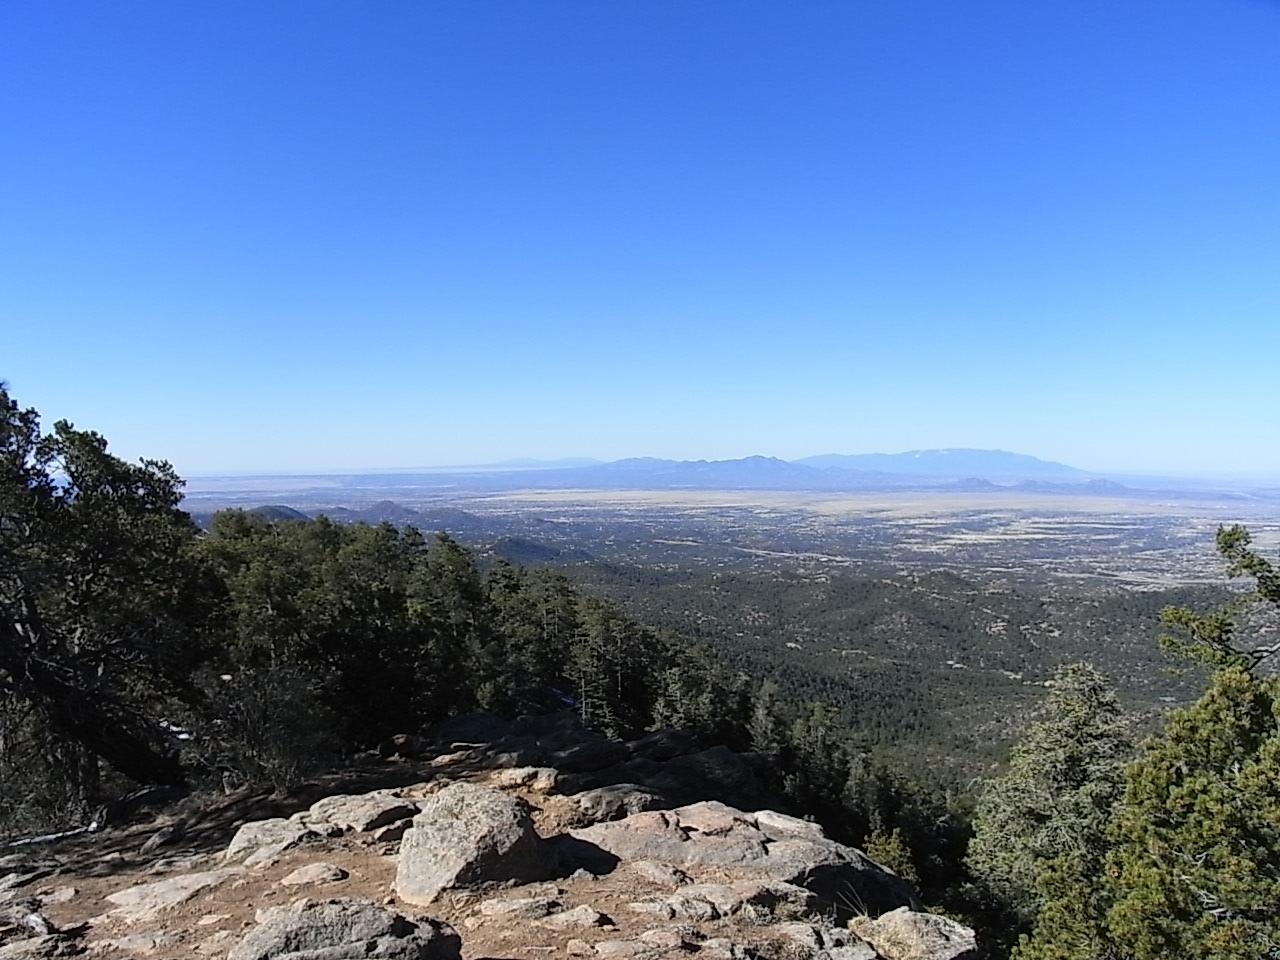 Altitude Of Santa Fe Nm >> Elevation Of Thompson Peak New Mexico Usa Topographic